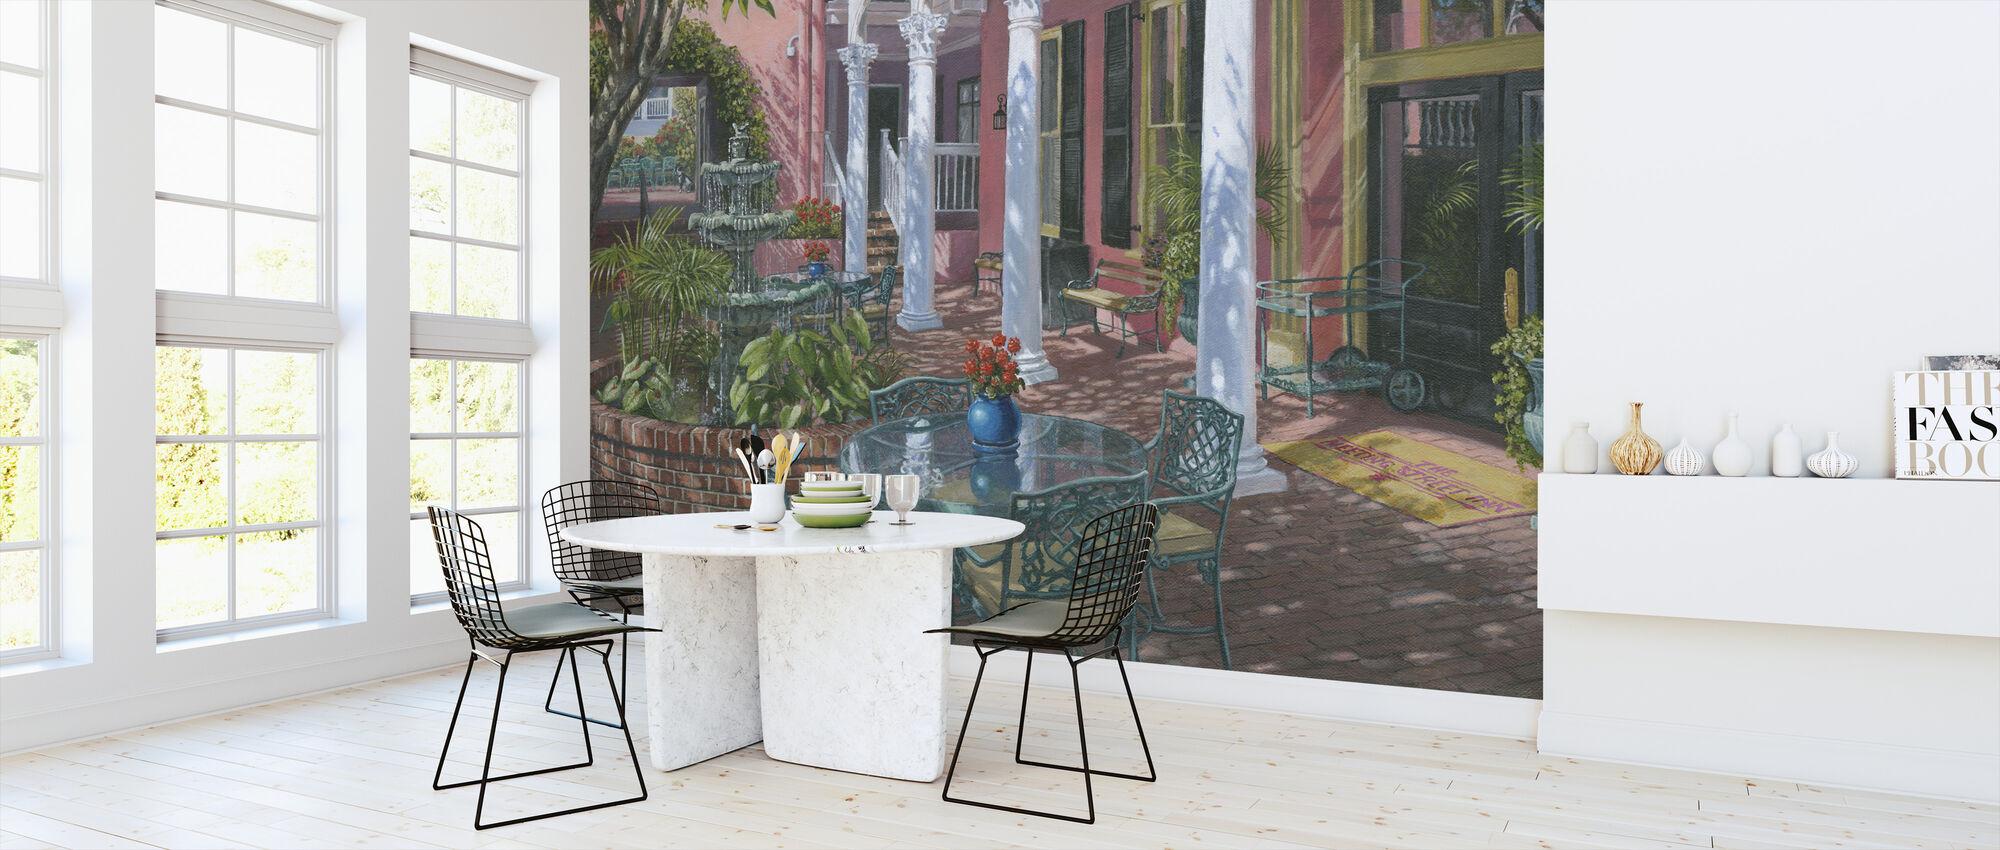 Meeting Street Inn Charleston - Wallpaper - Kitchen